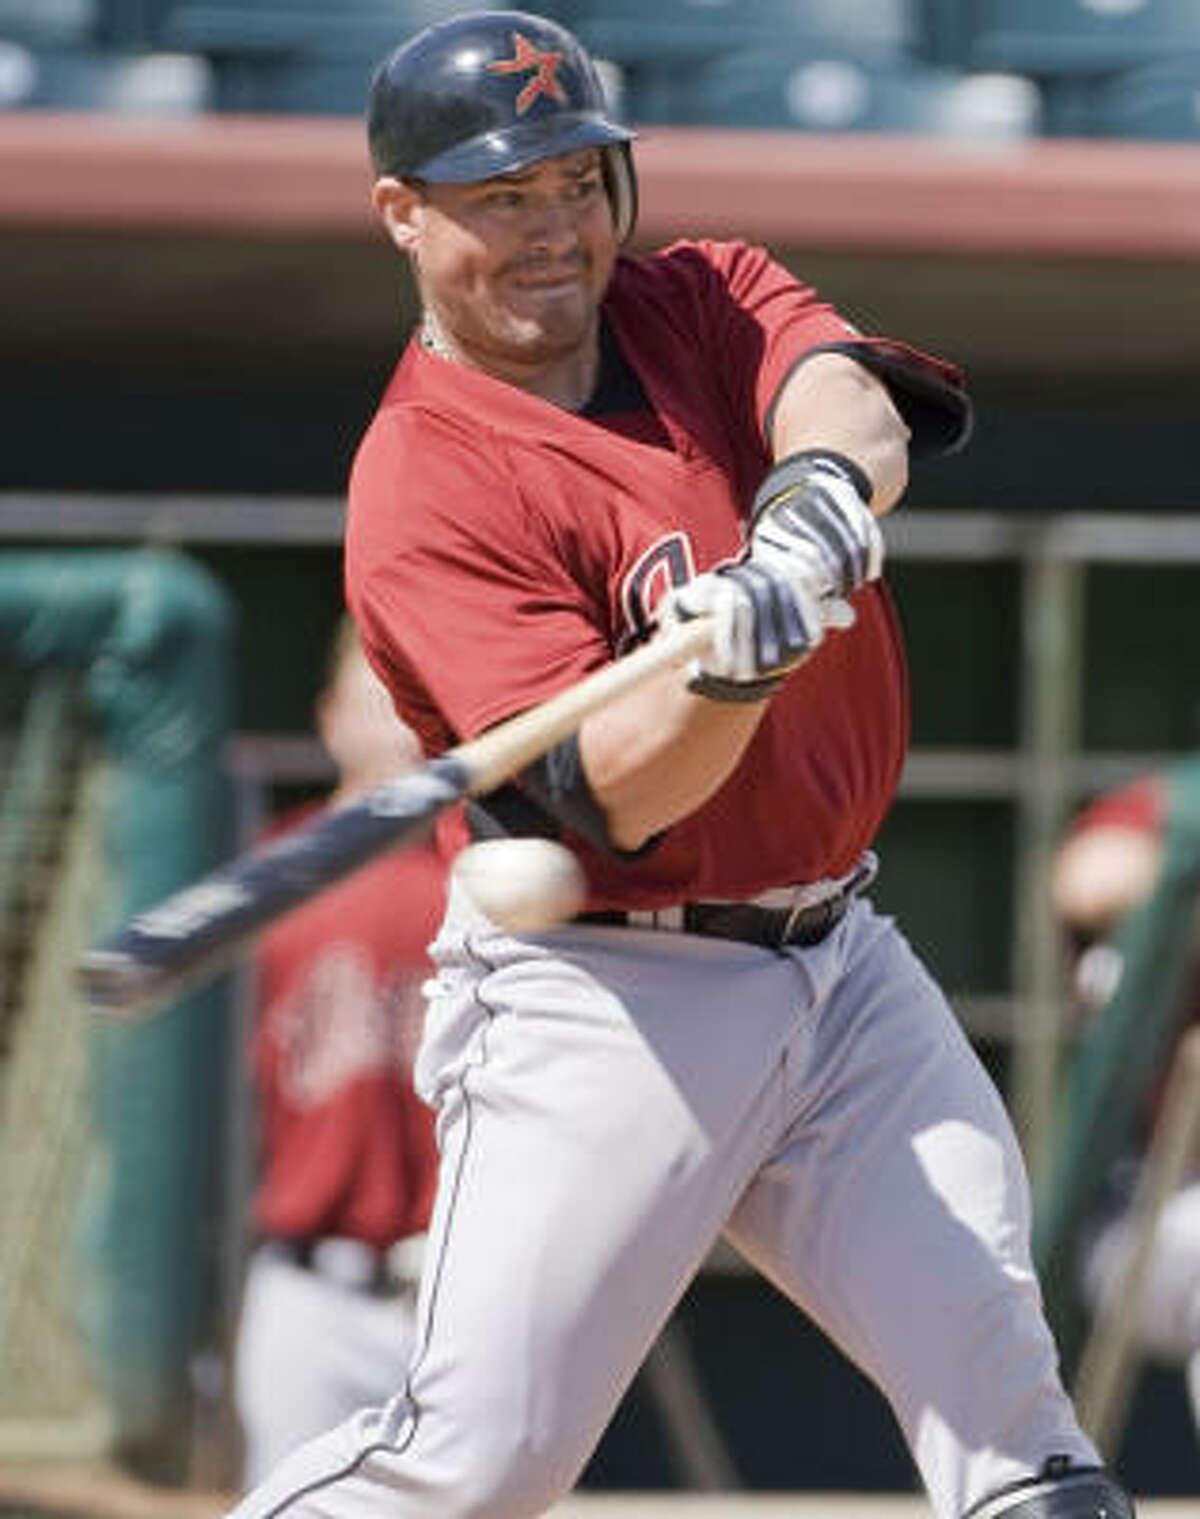 Humberto Quintero takes a swing.